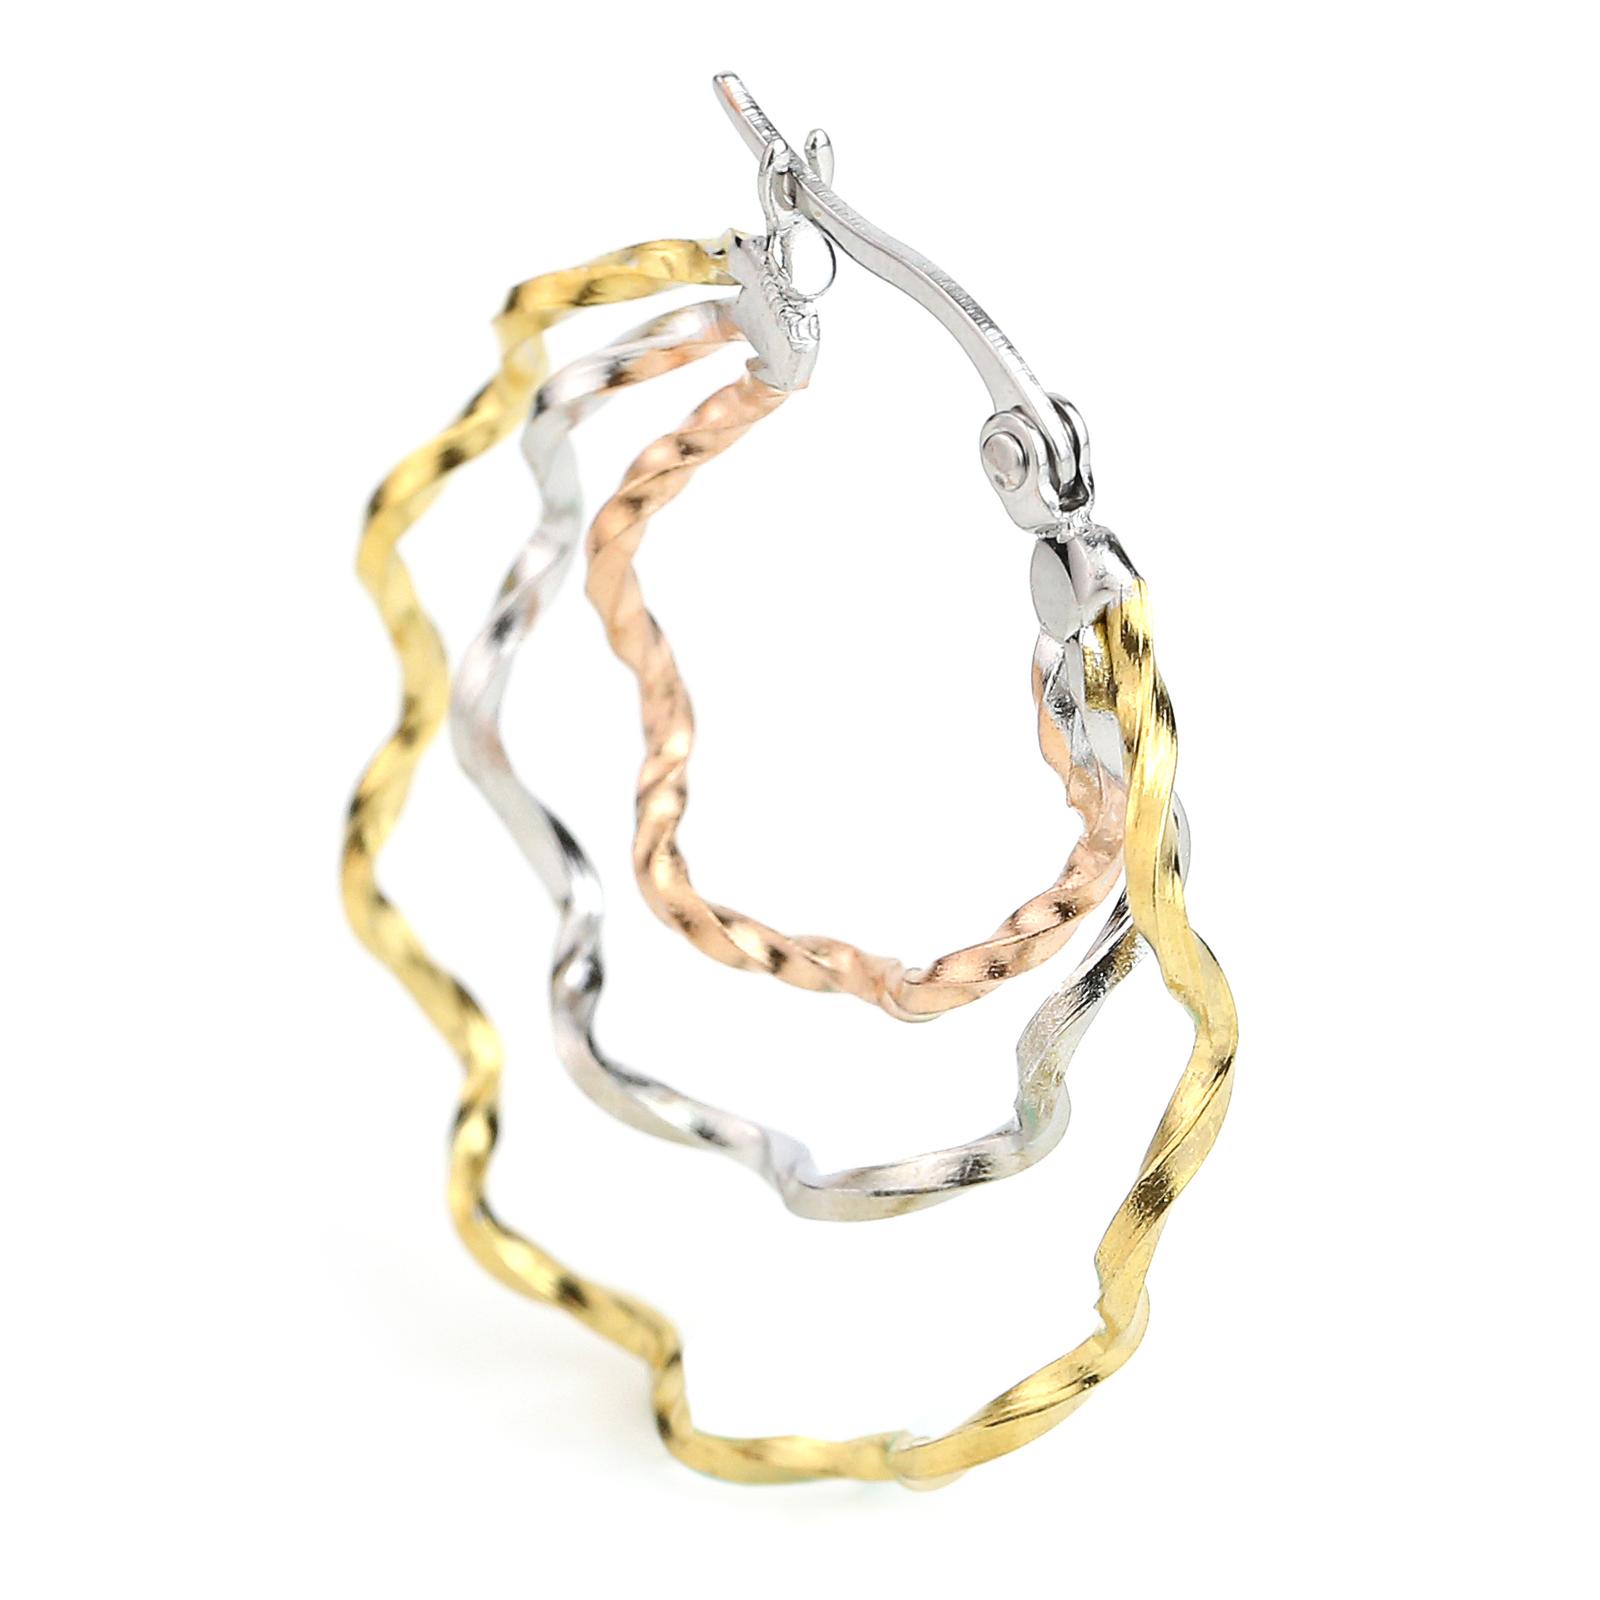 Whimsical Tri-Color Silver, Gold & Rose Tone Hoop Earrings- United Elegance